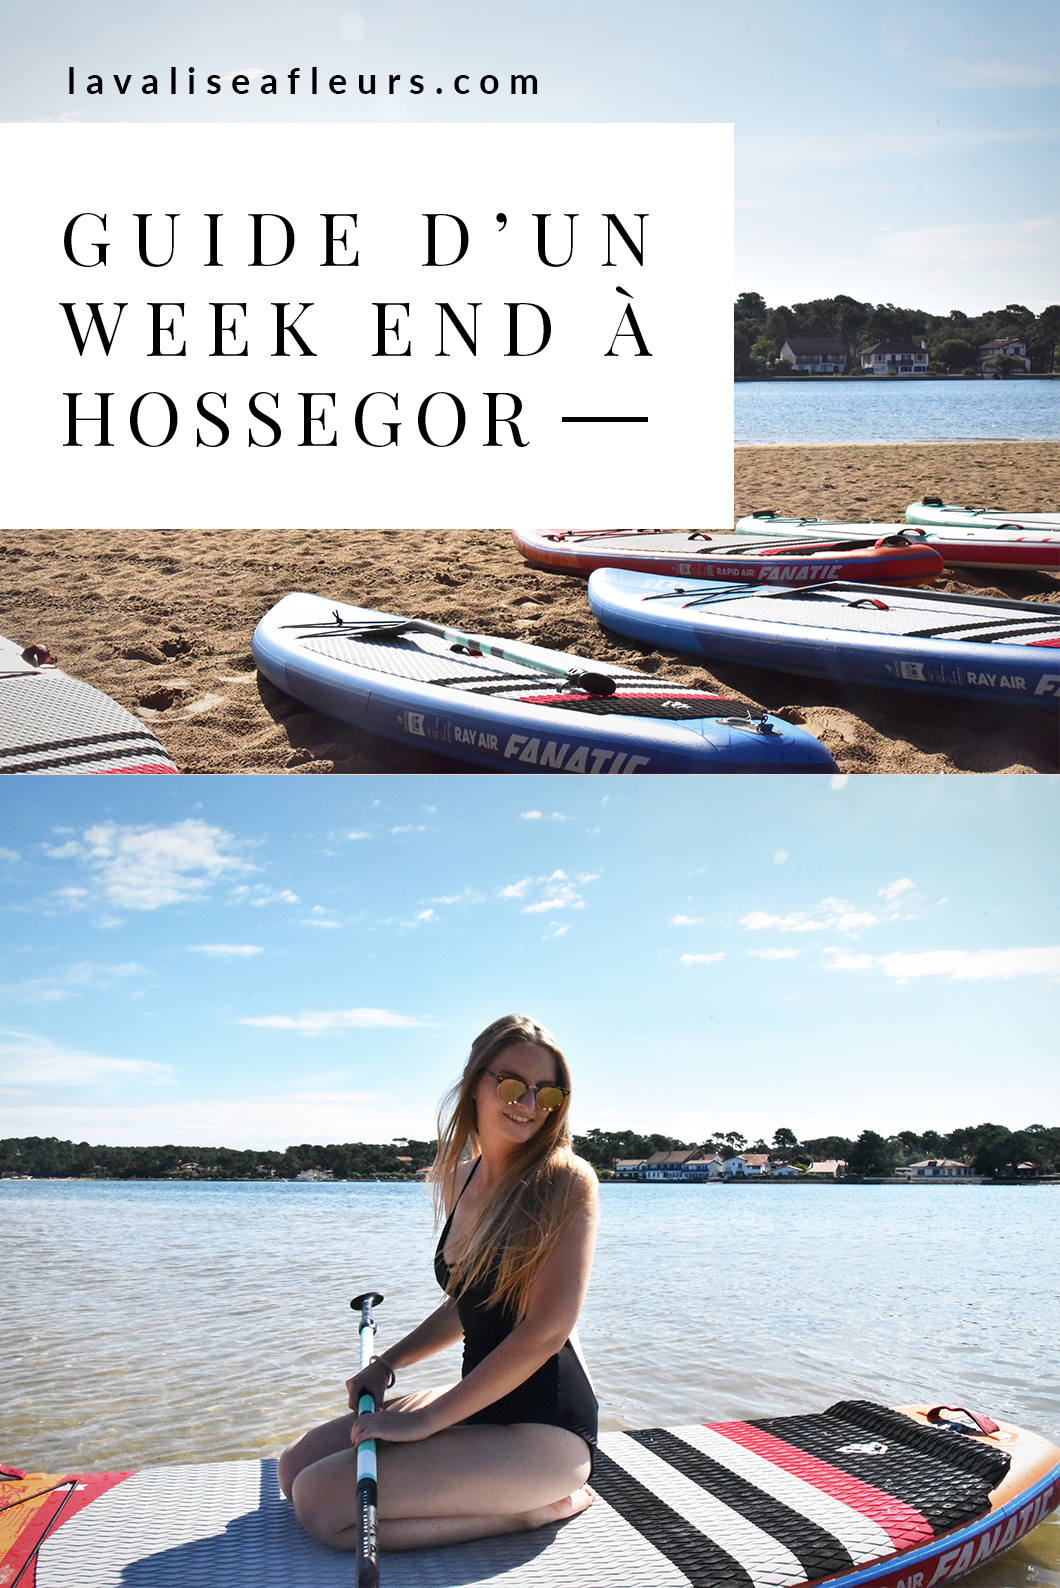 Guide d'un week end à Hossegor